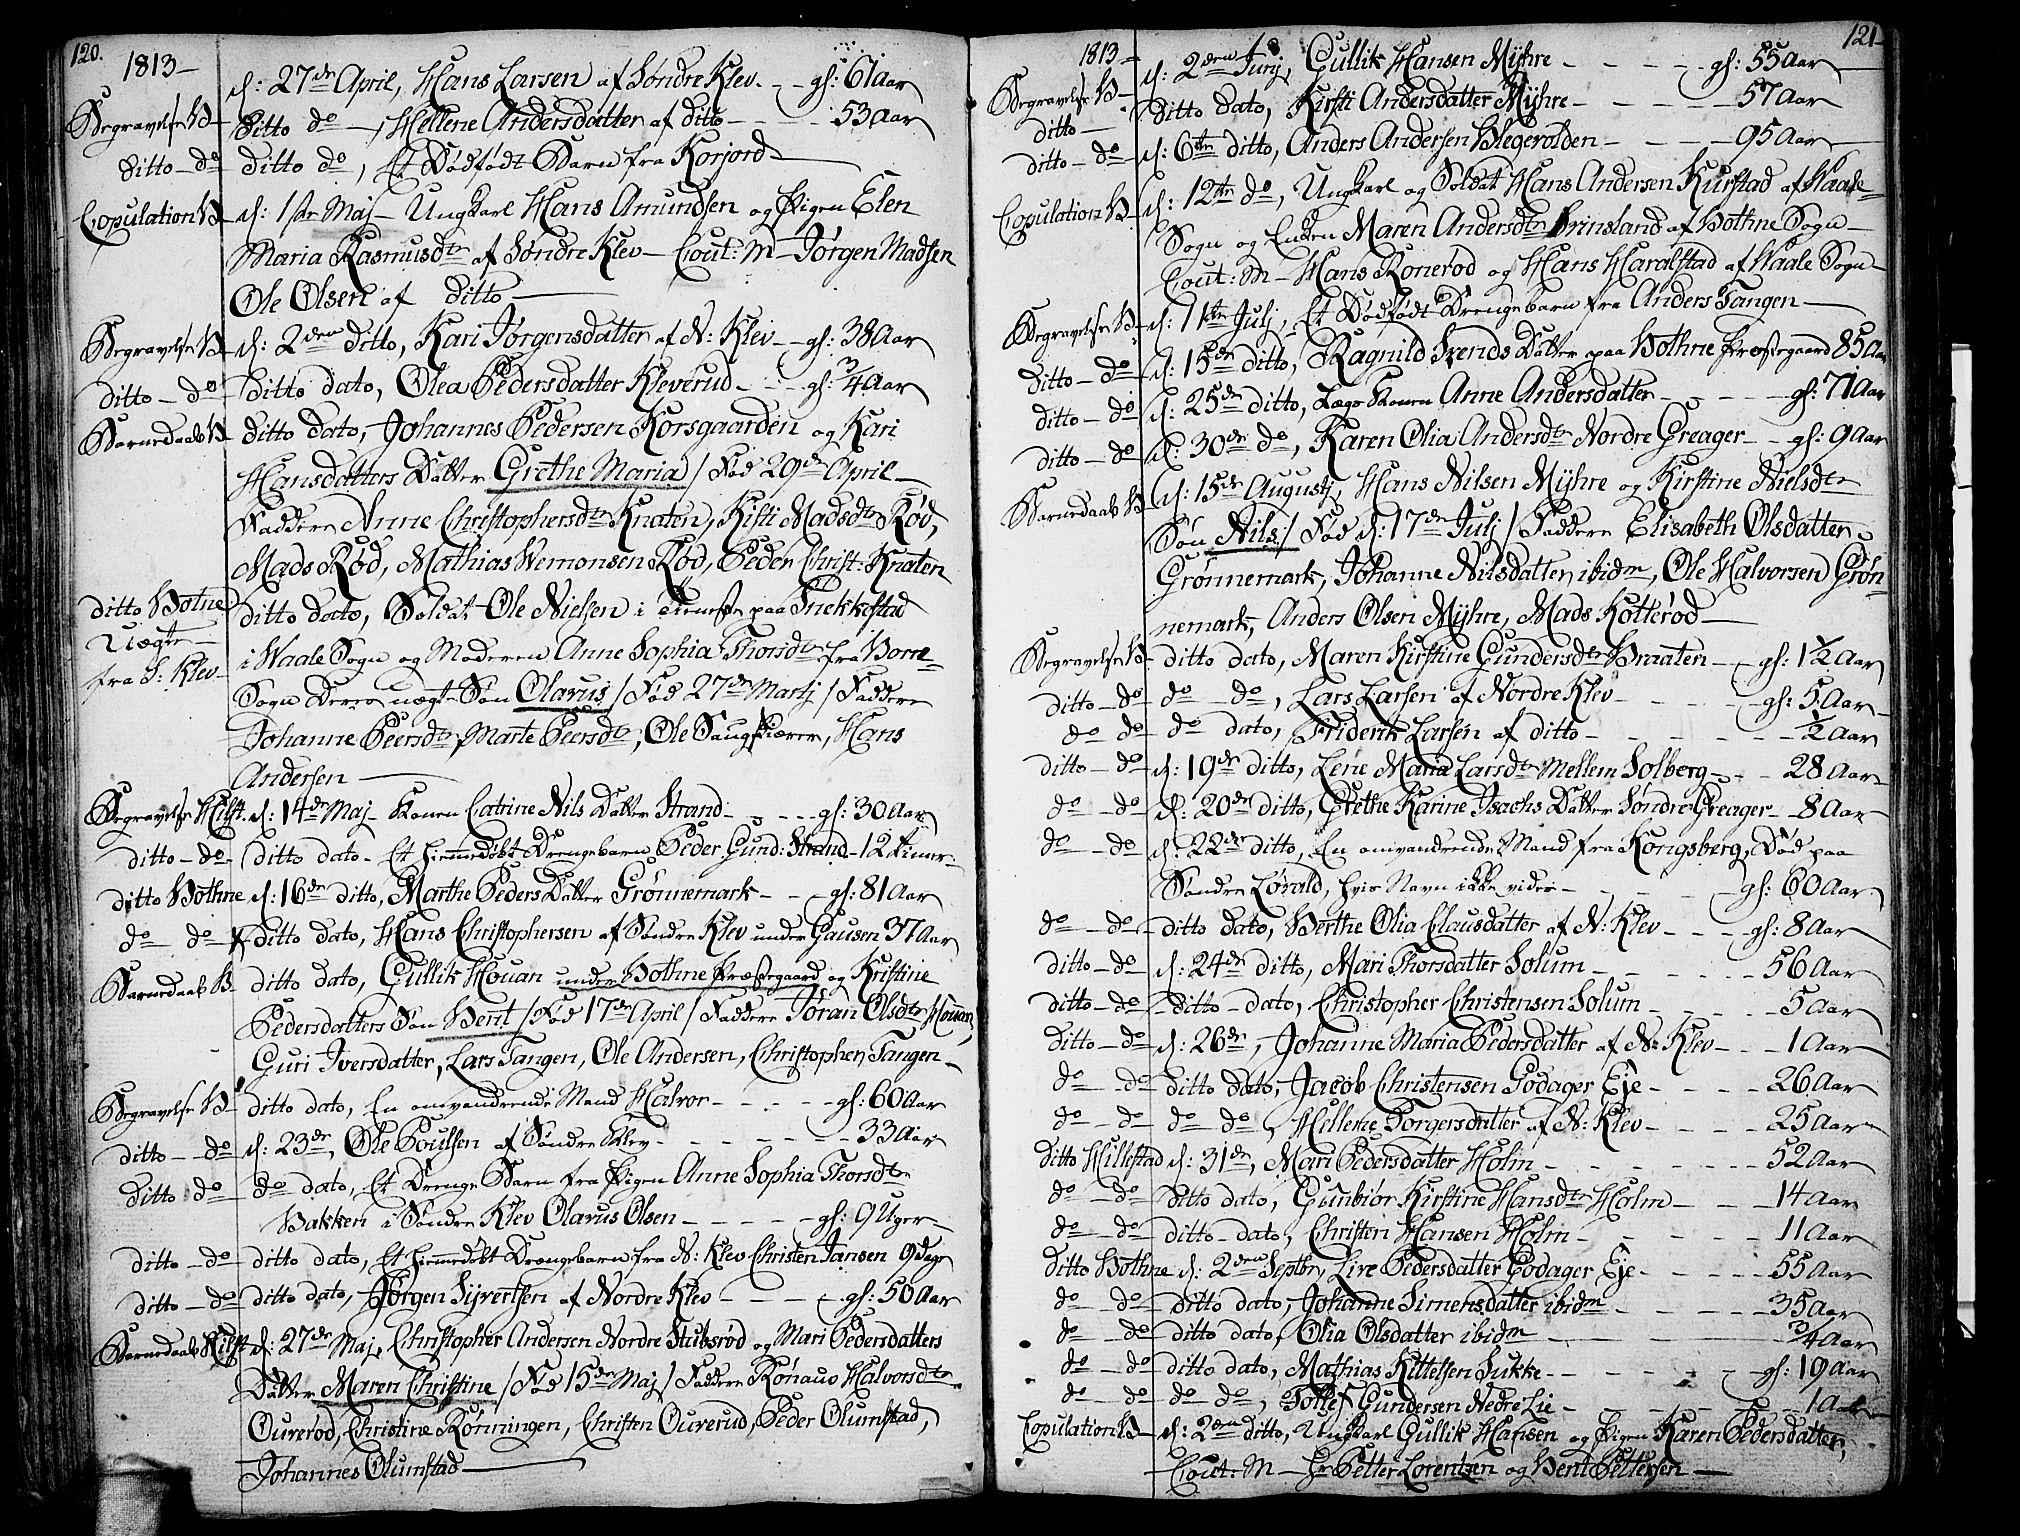 SAKO, Botne kirkebøker, F/Fa/L0003: Parish register (official) no. I 3 /1, 1792-1844, p. 120-121